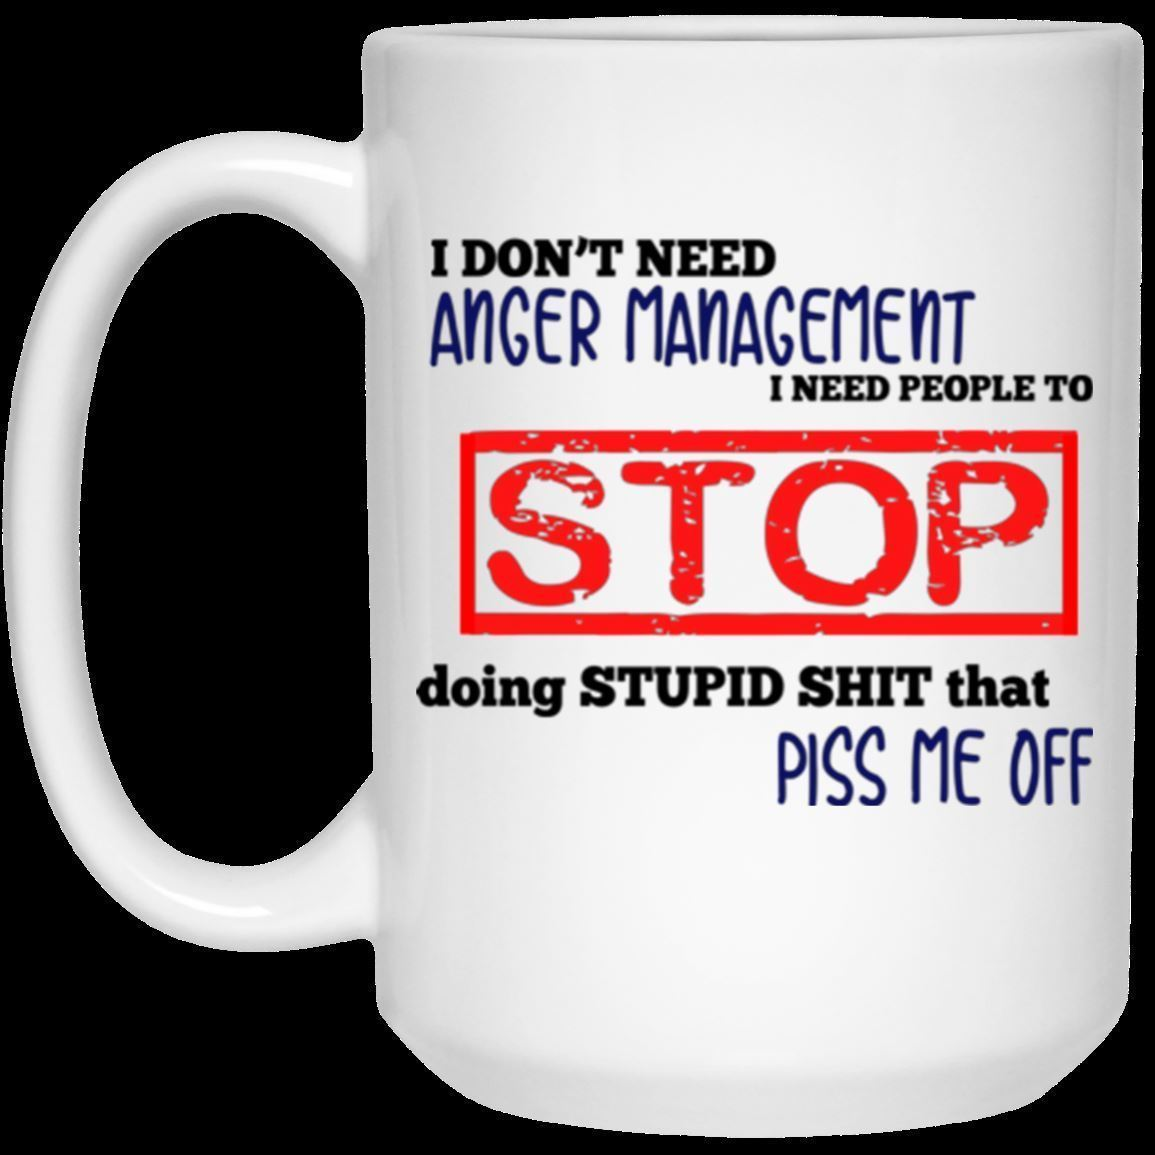 Coffee Mugs For Women - I don't Need Anger Management  Premium Coffee mug Gift S